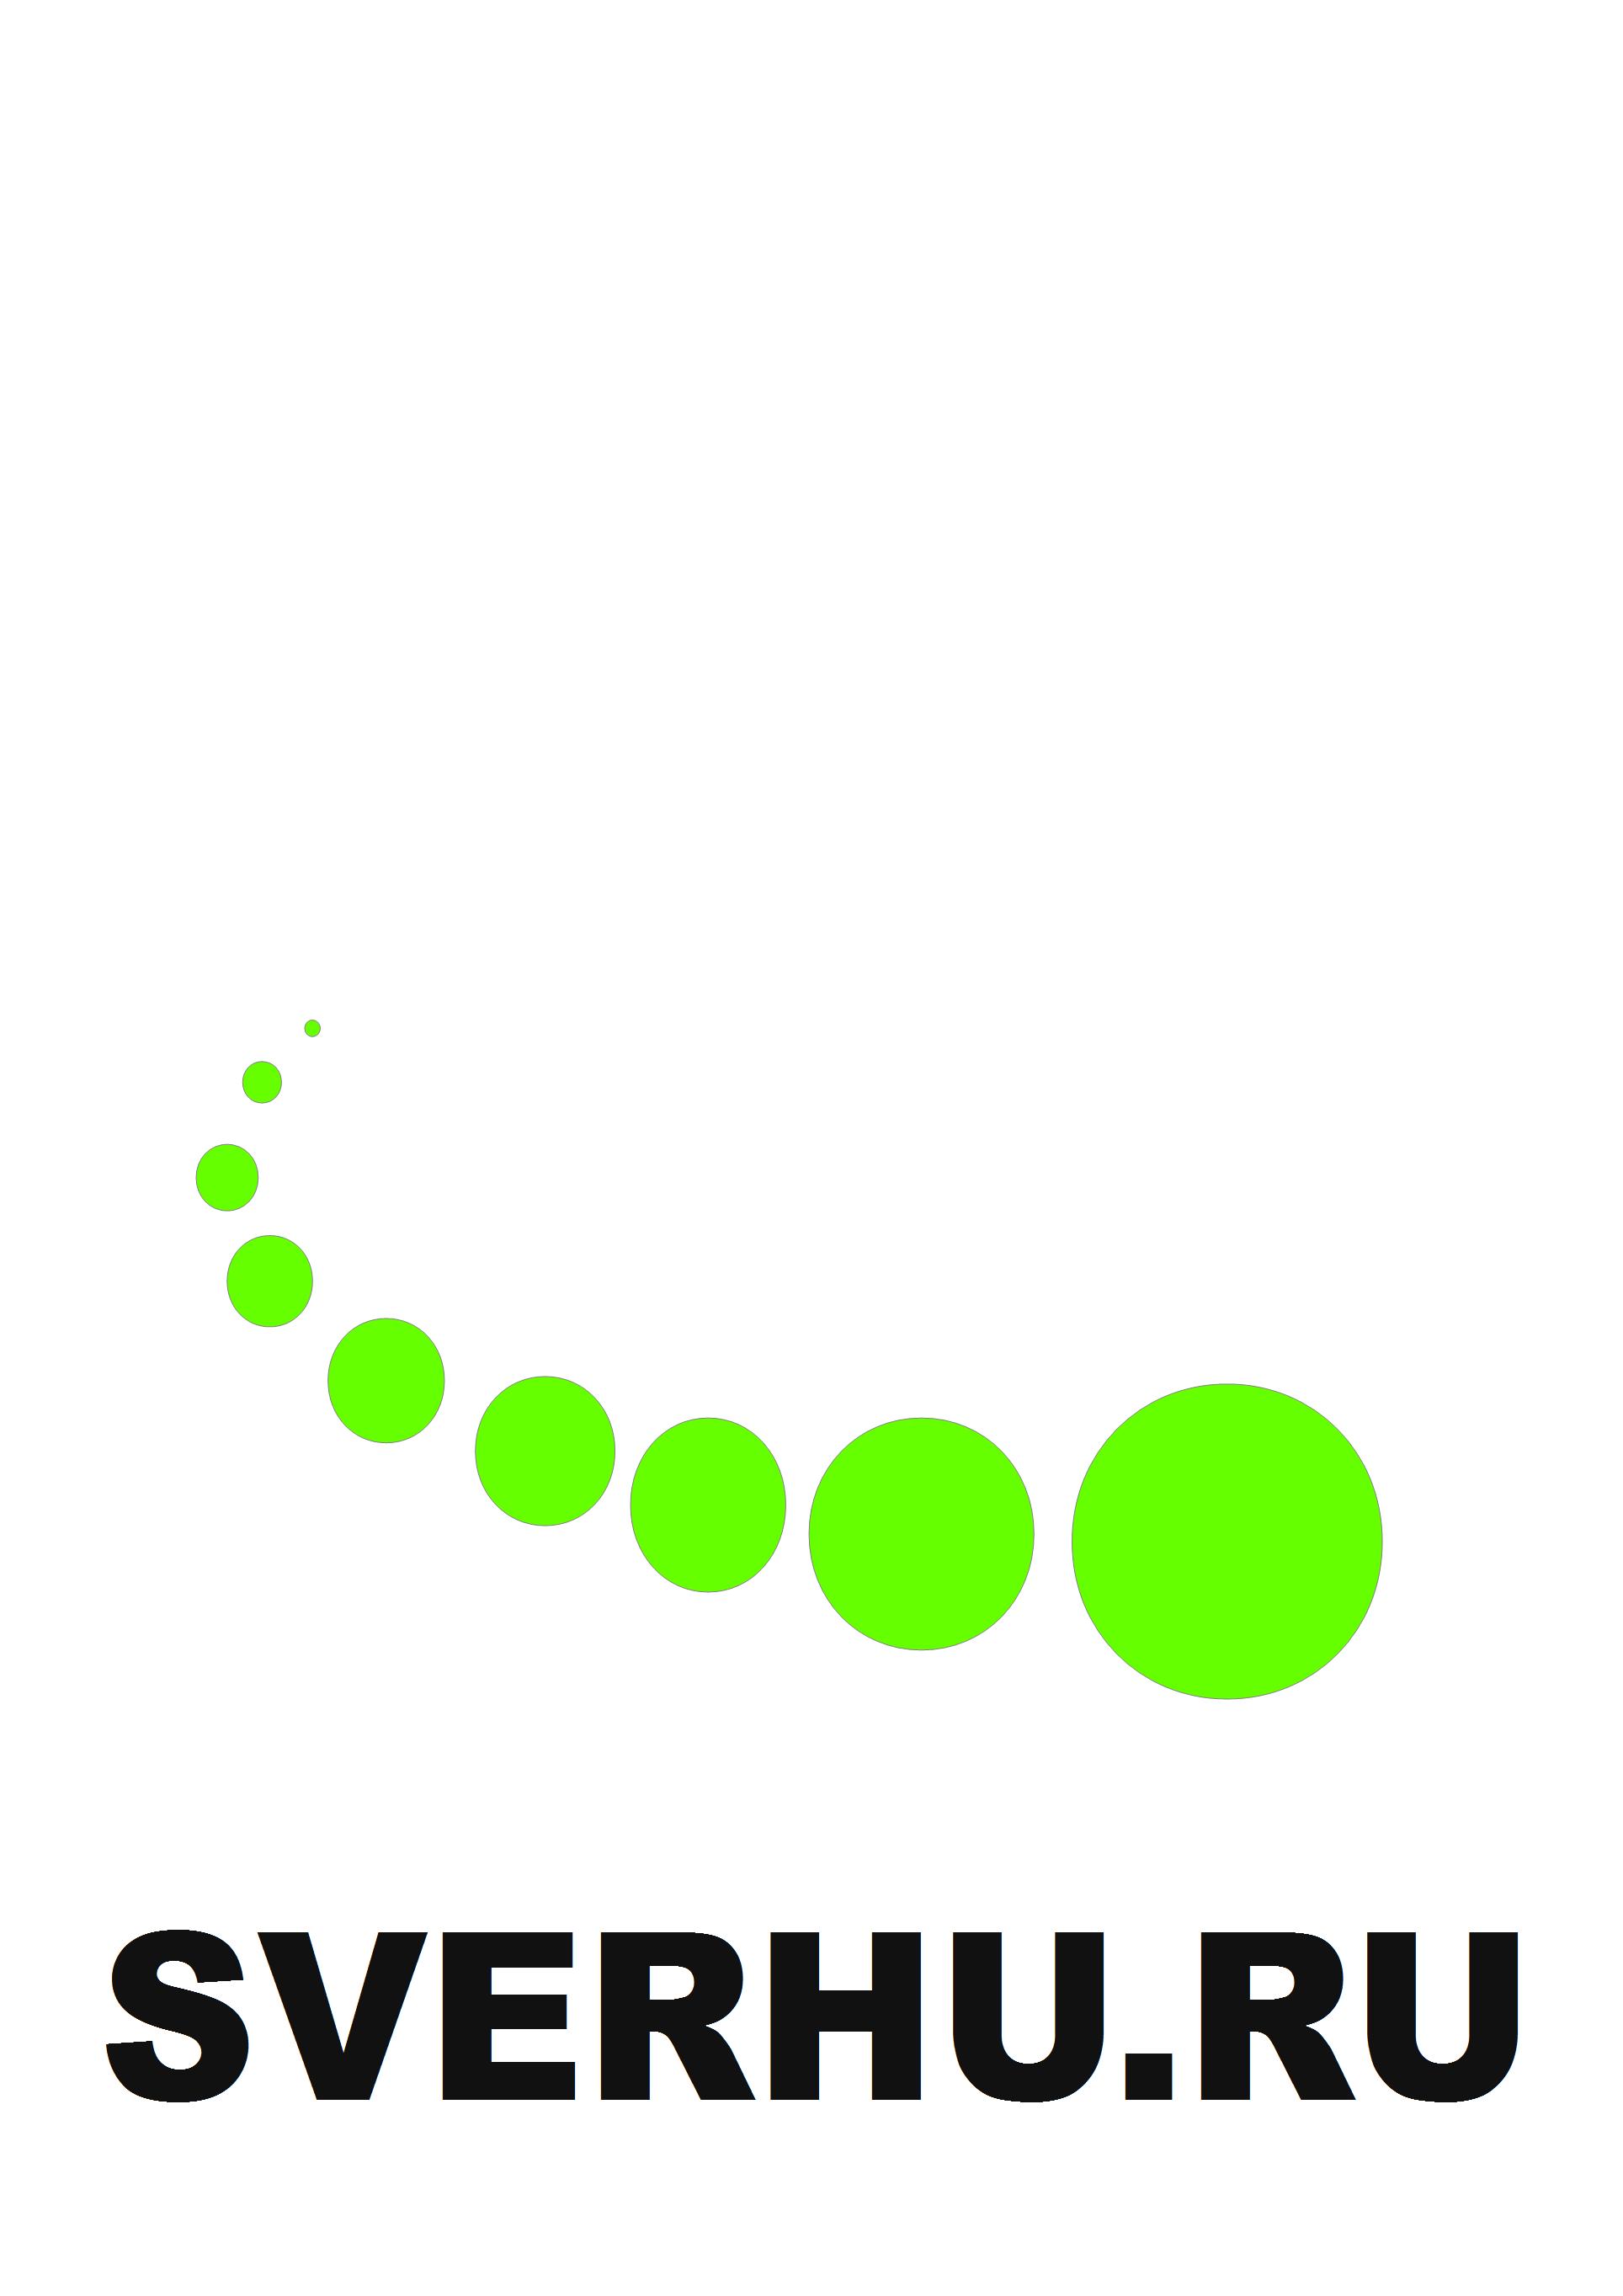 логотип  фото f_94855c72811d9d96.png